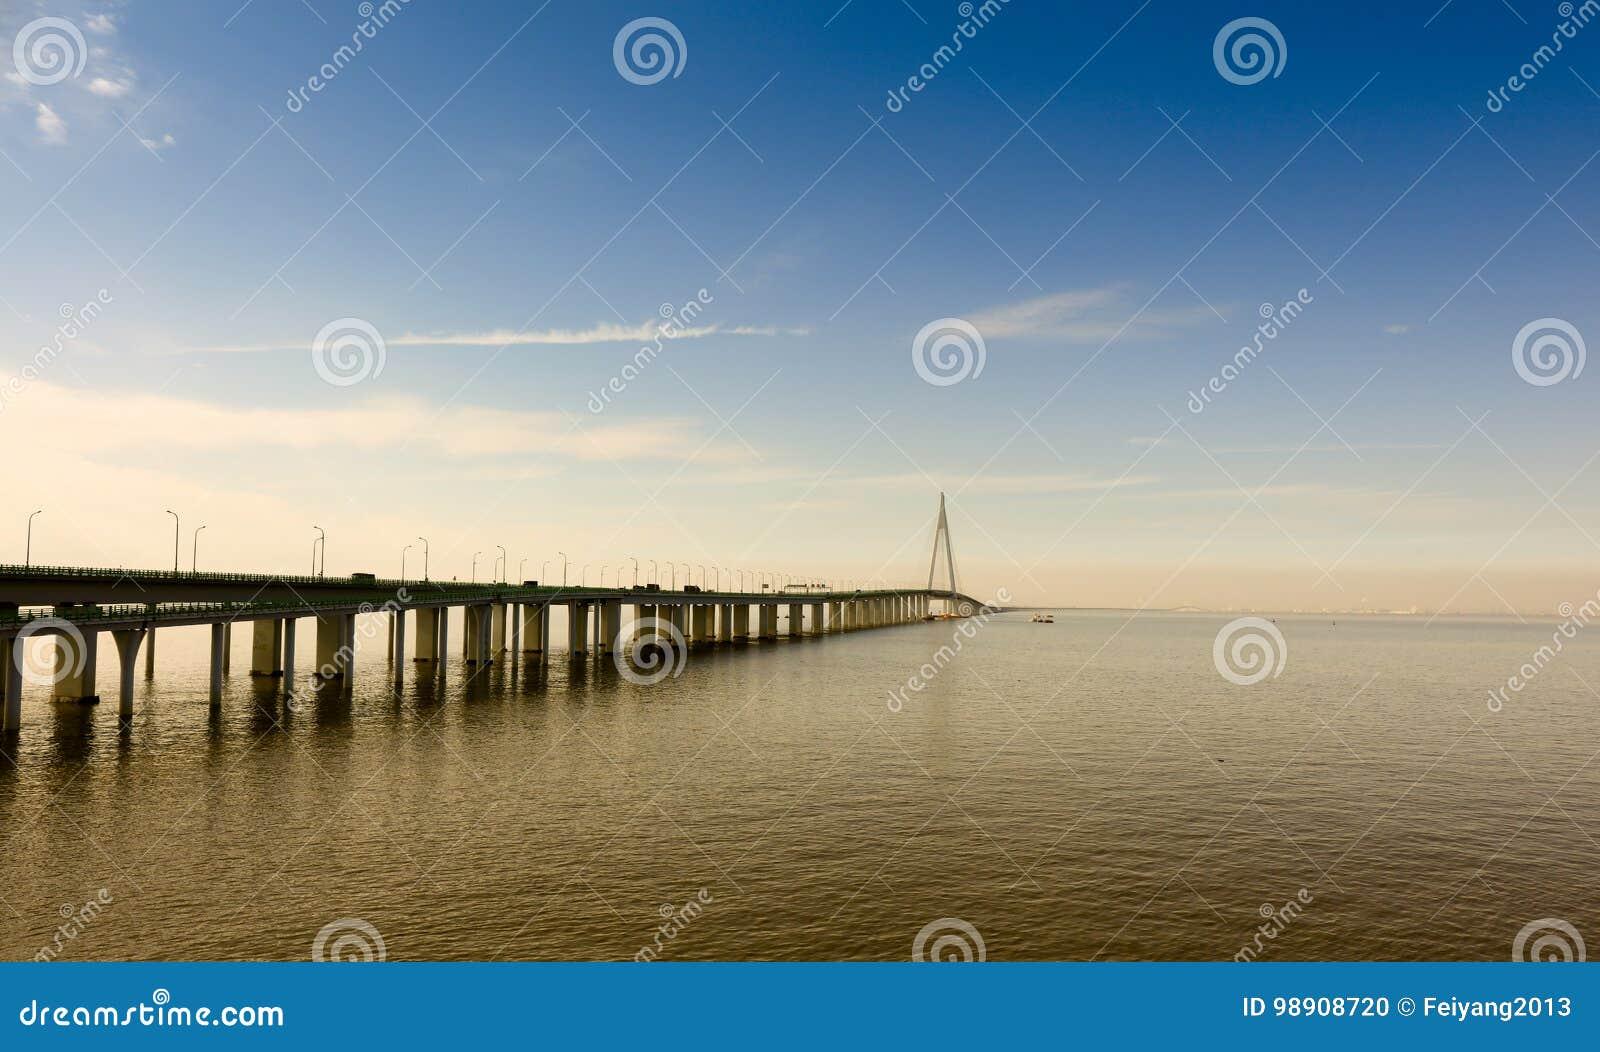 China `s Hangzhou Bay Bridge Editorial Image - Image of